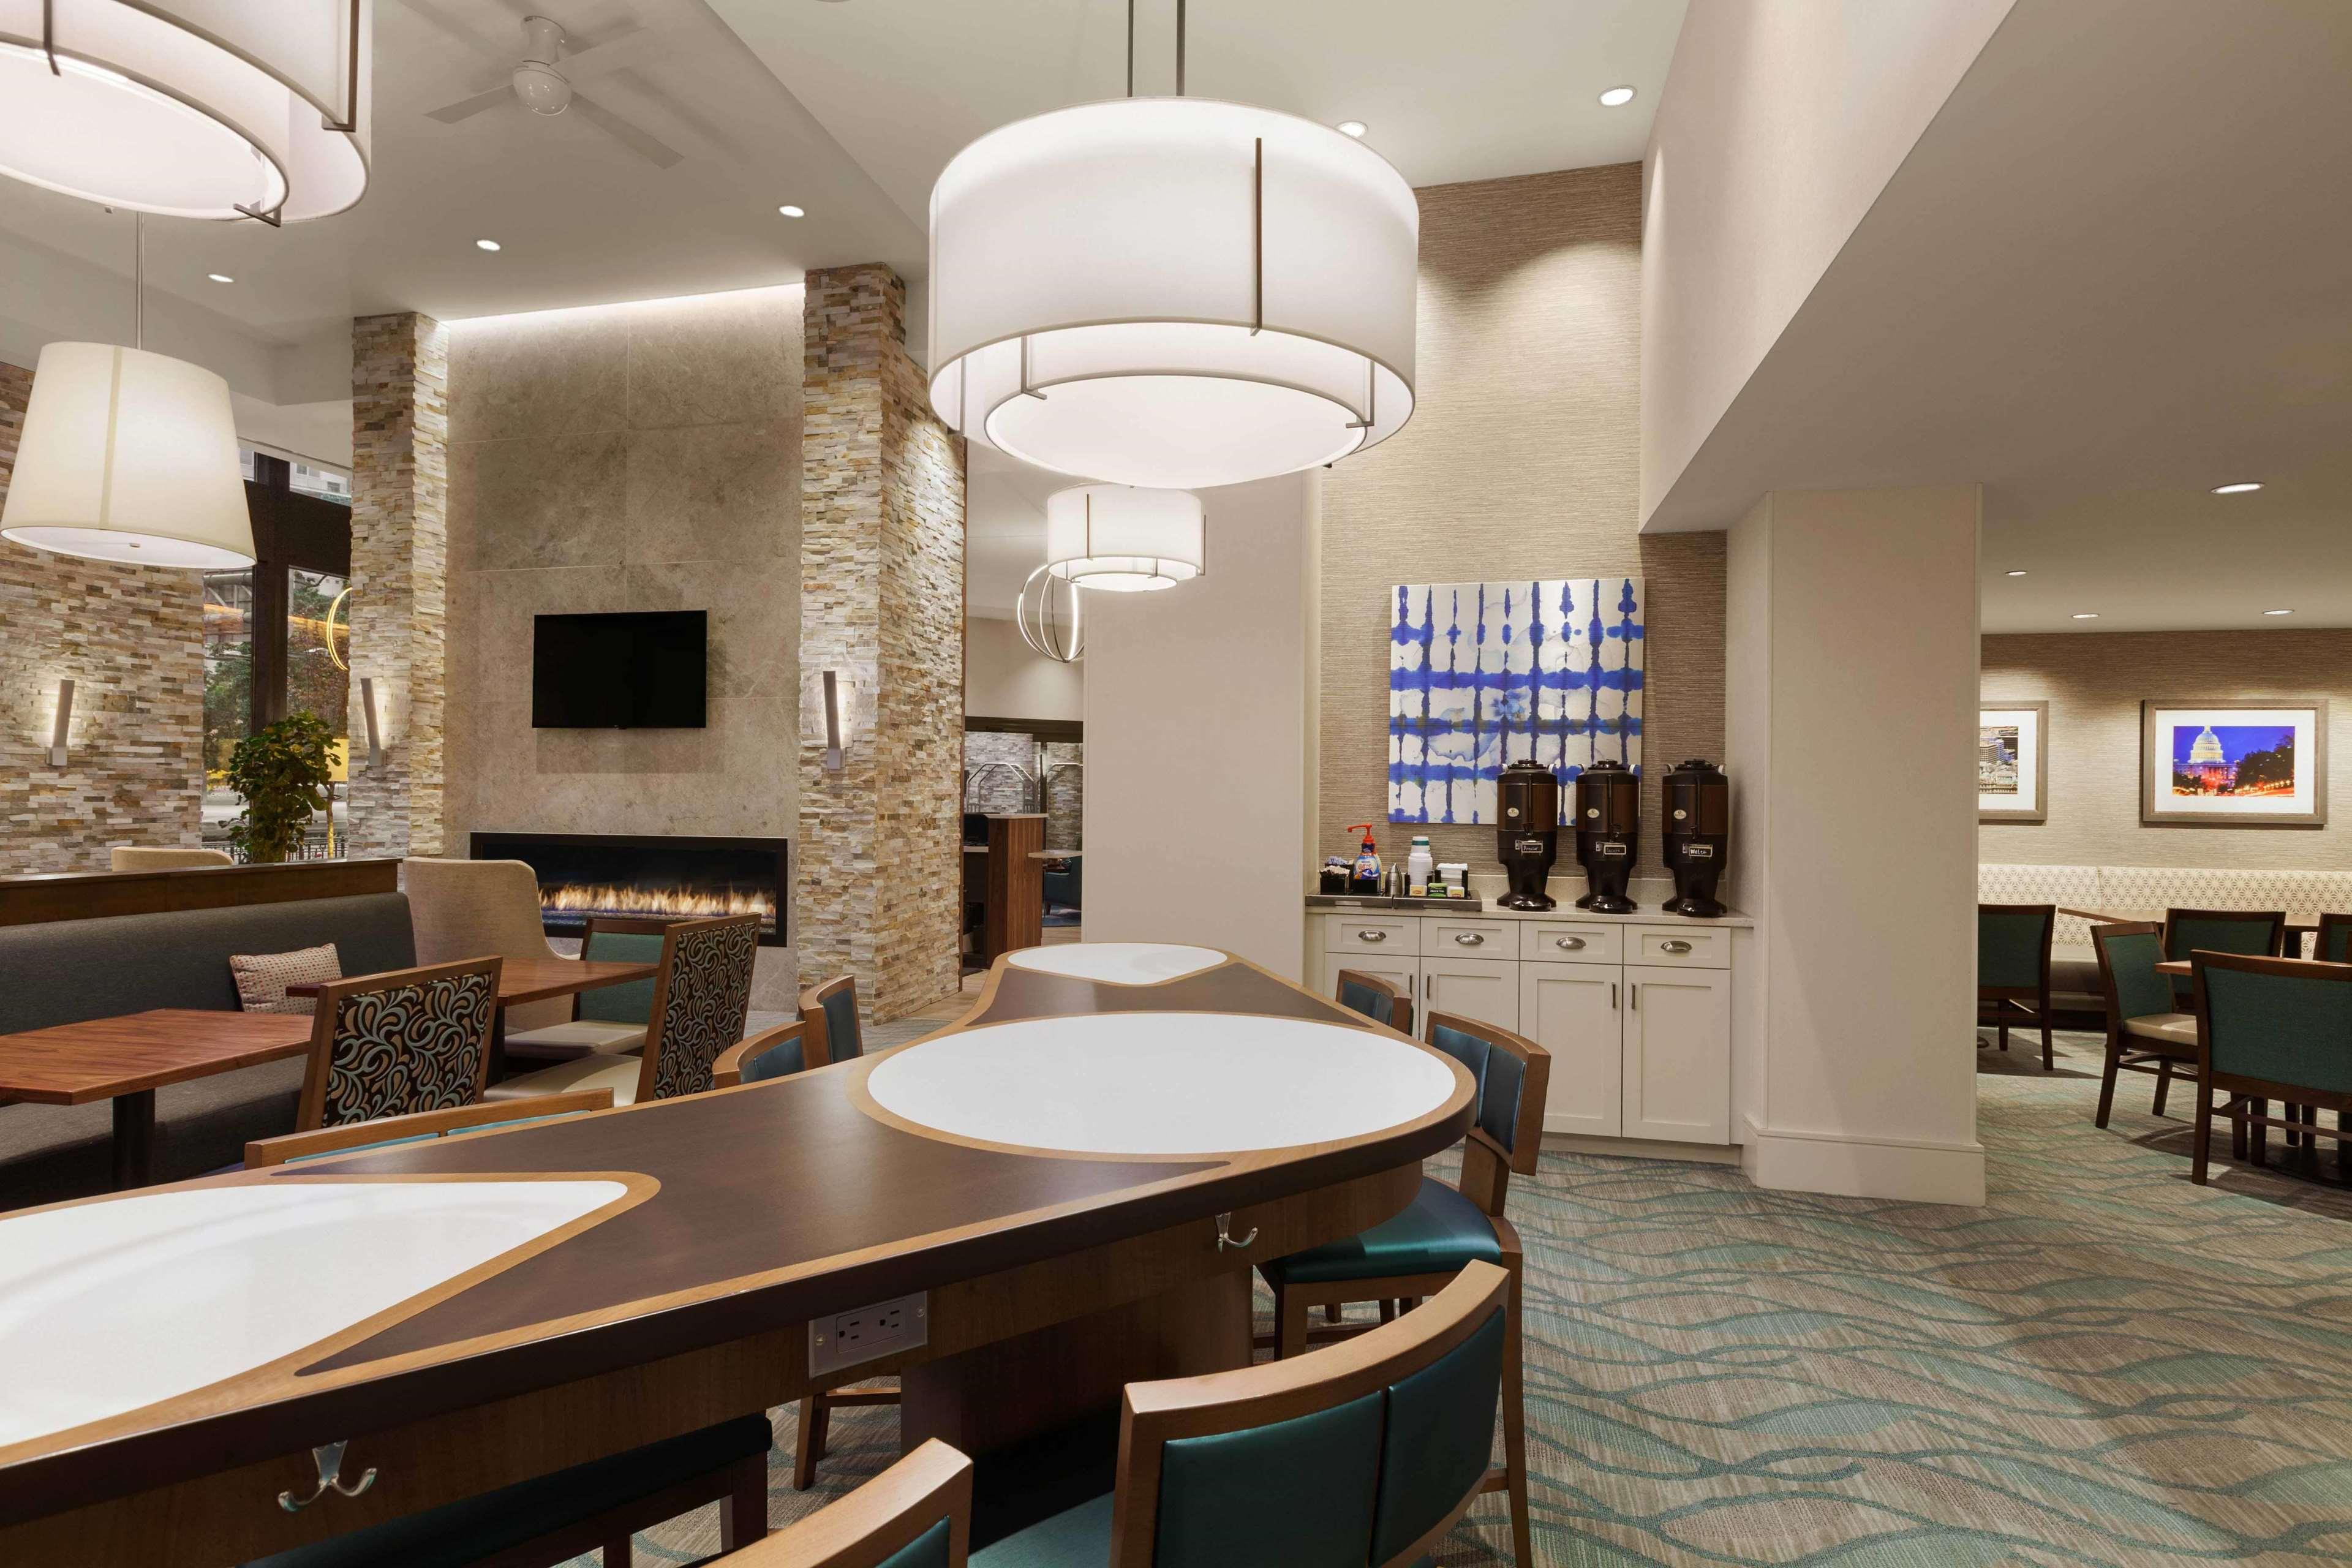 Homewood Suites by Hilton Washington DC Convention Center image 6